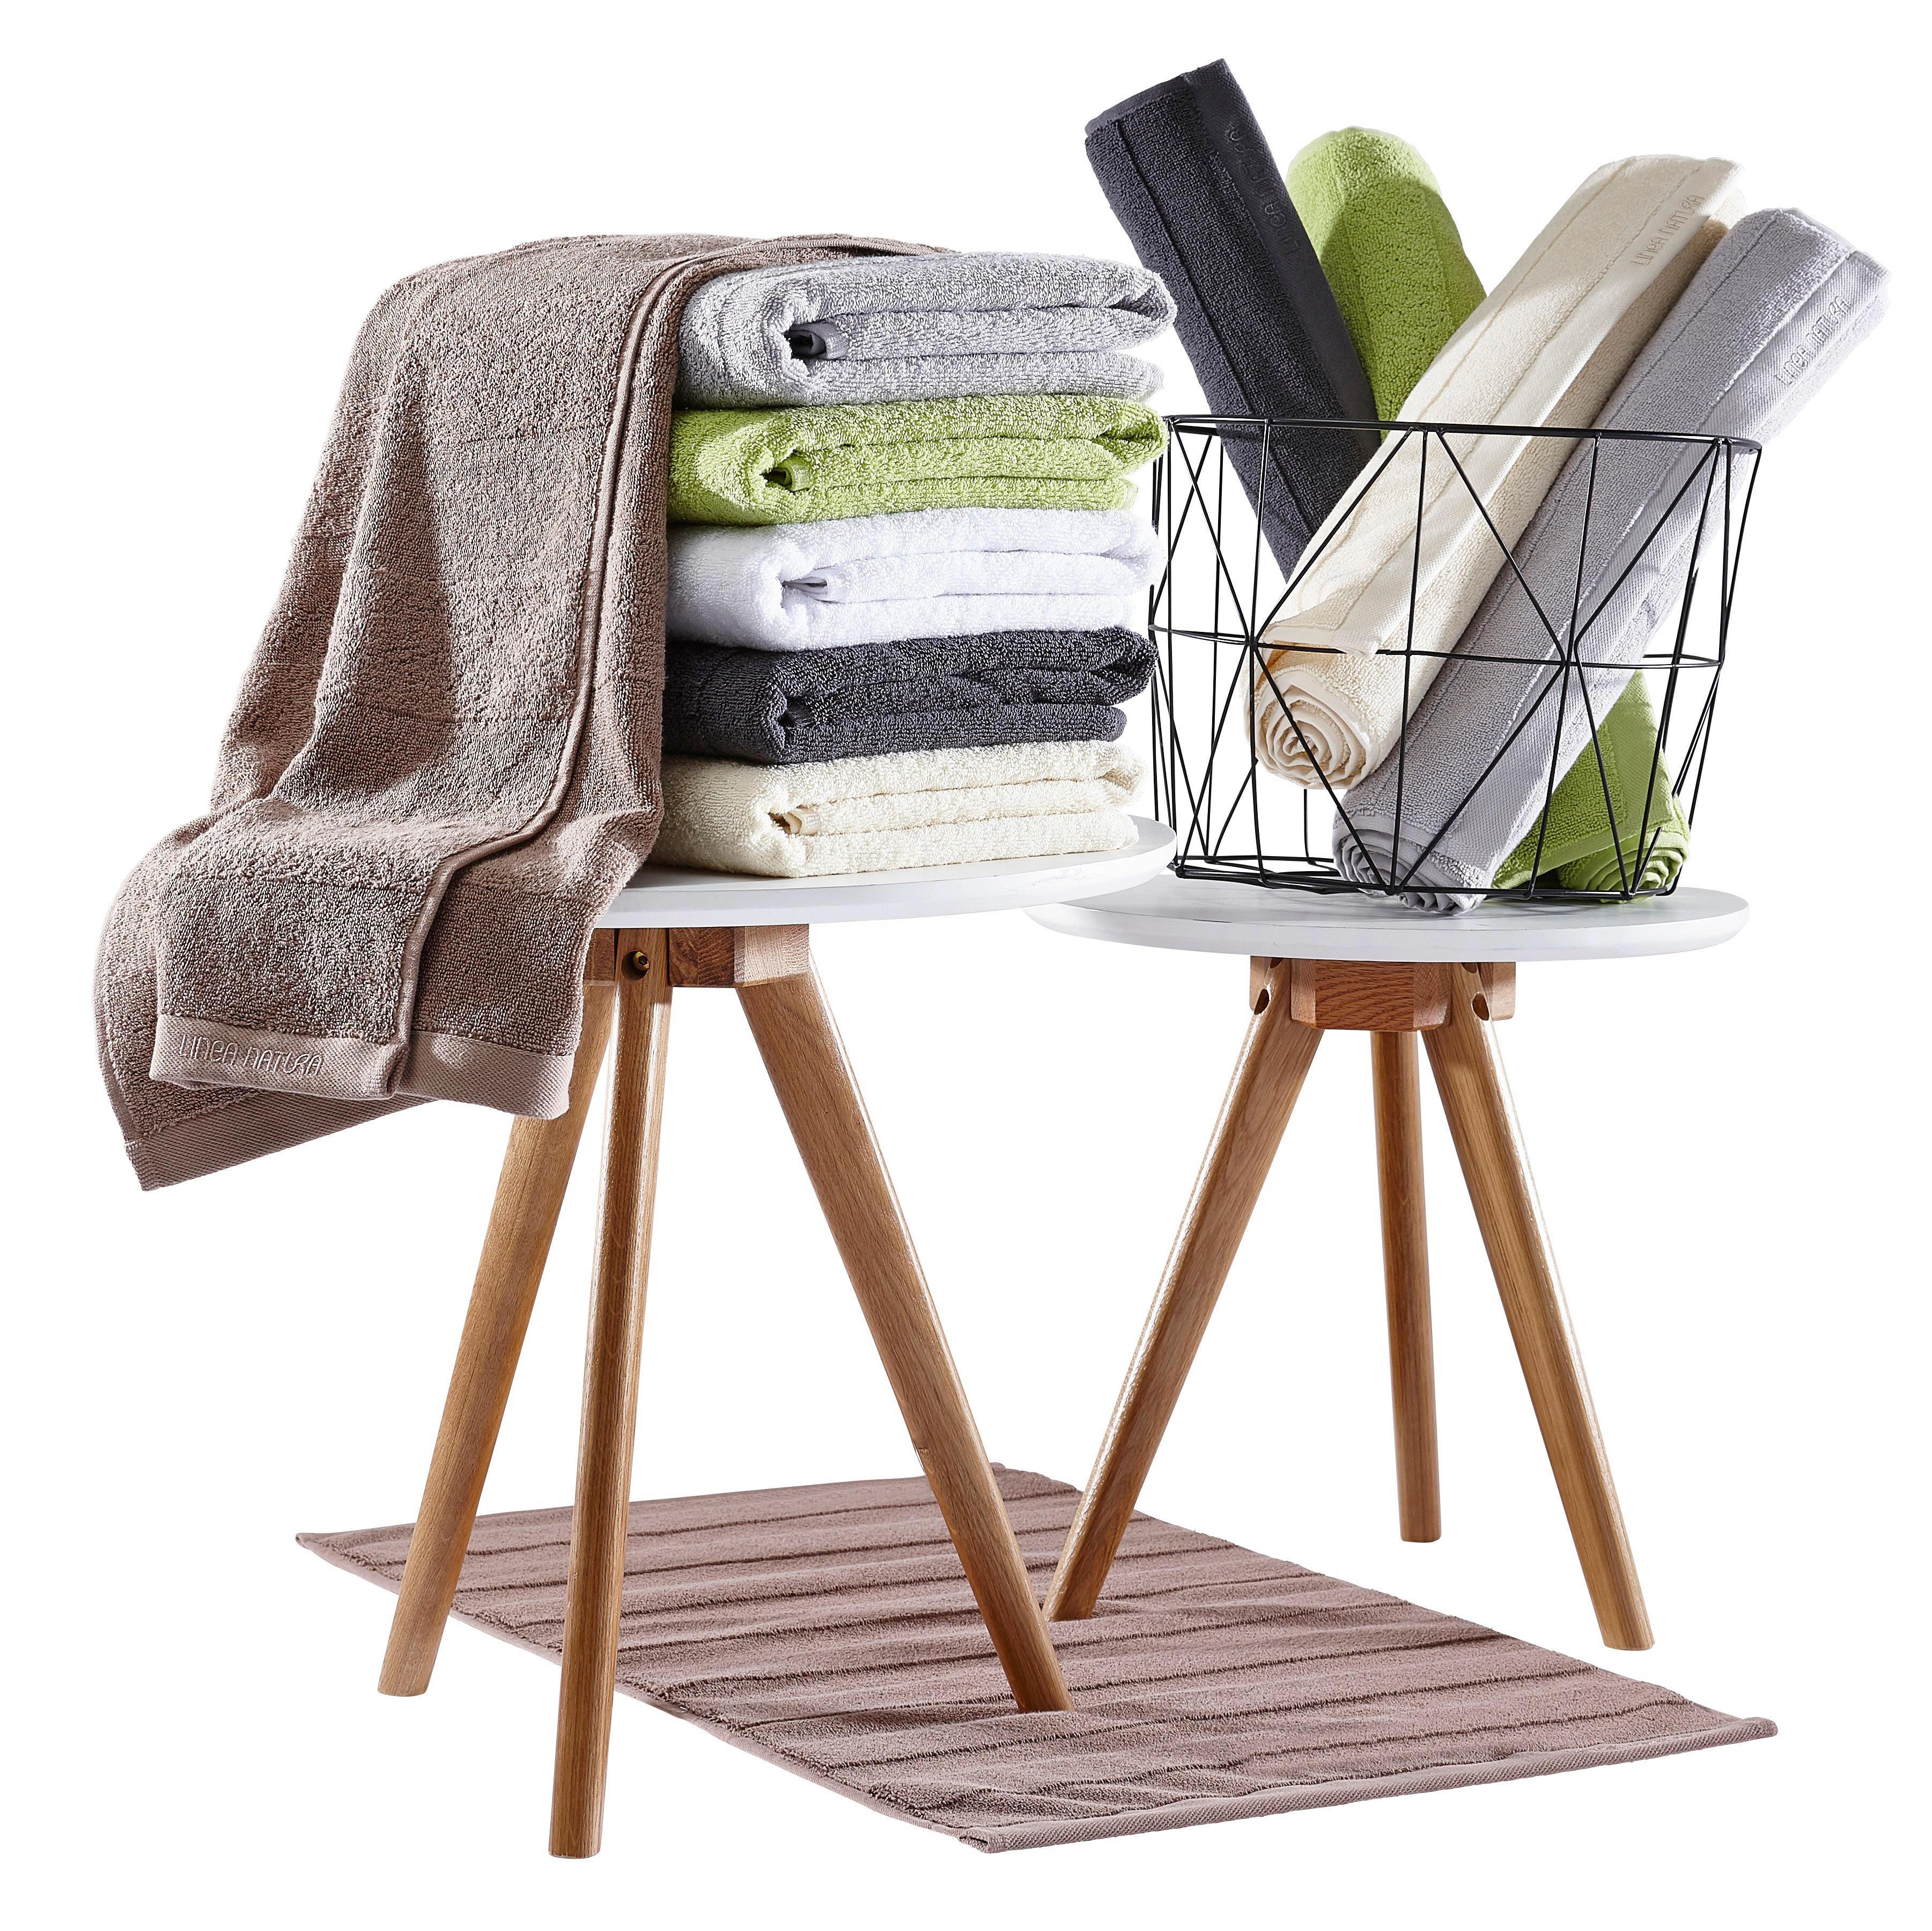 HANDTUCH 50/100 cm - Anthrazit, Basics, Textil (50/100cm) - LINEA NATURA